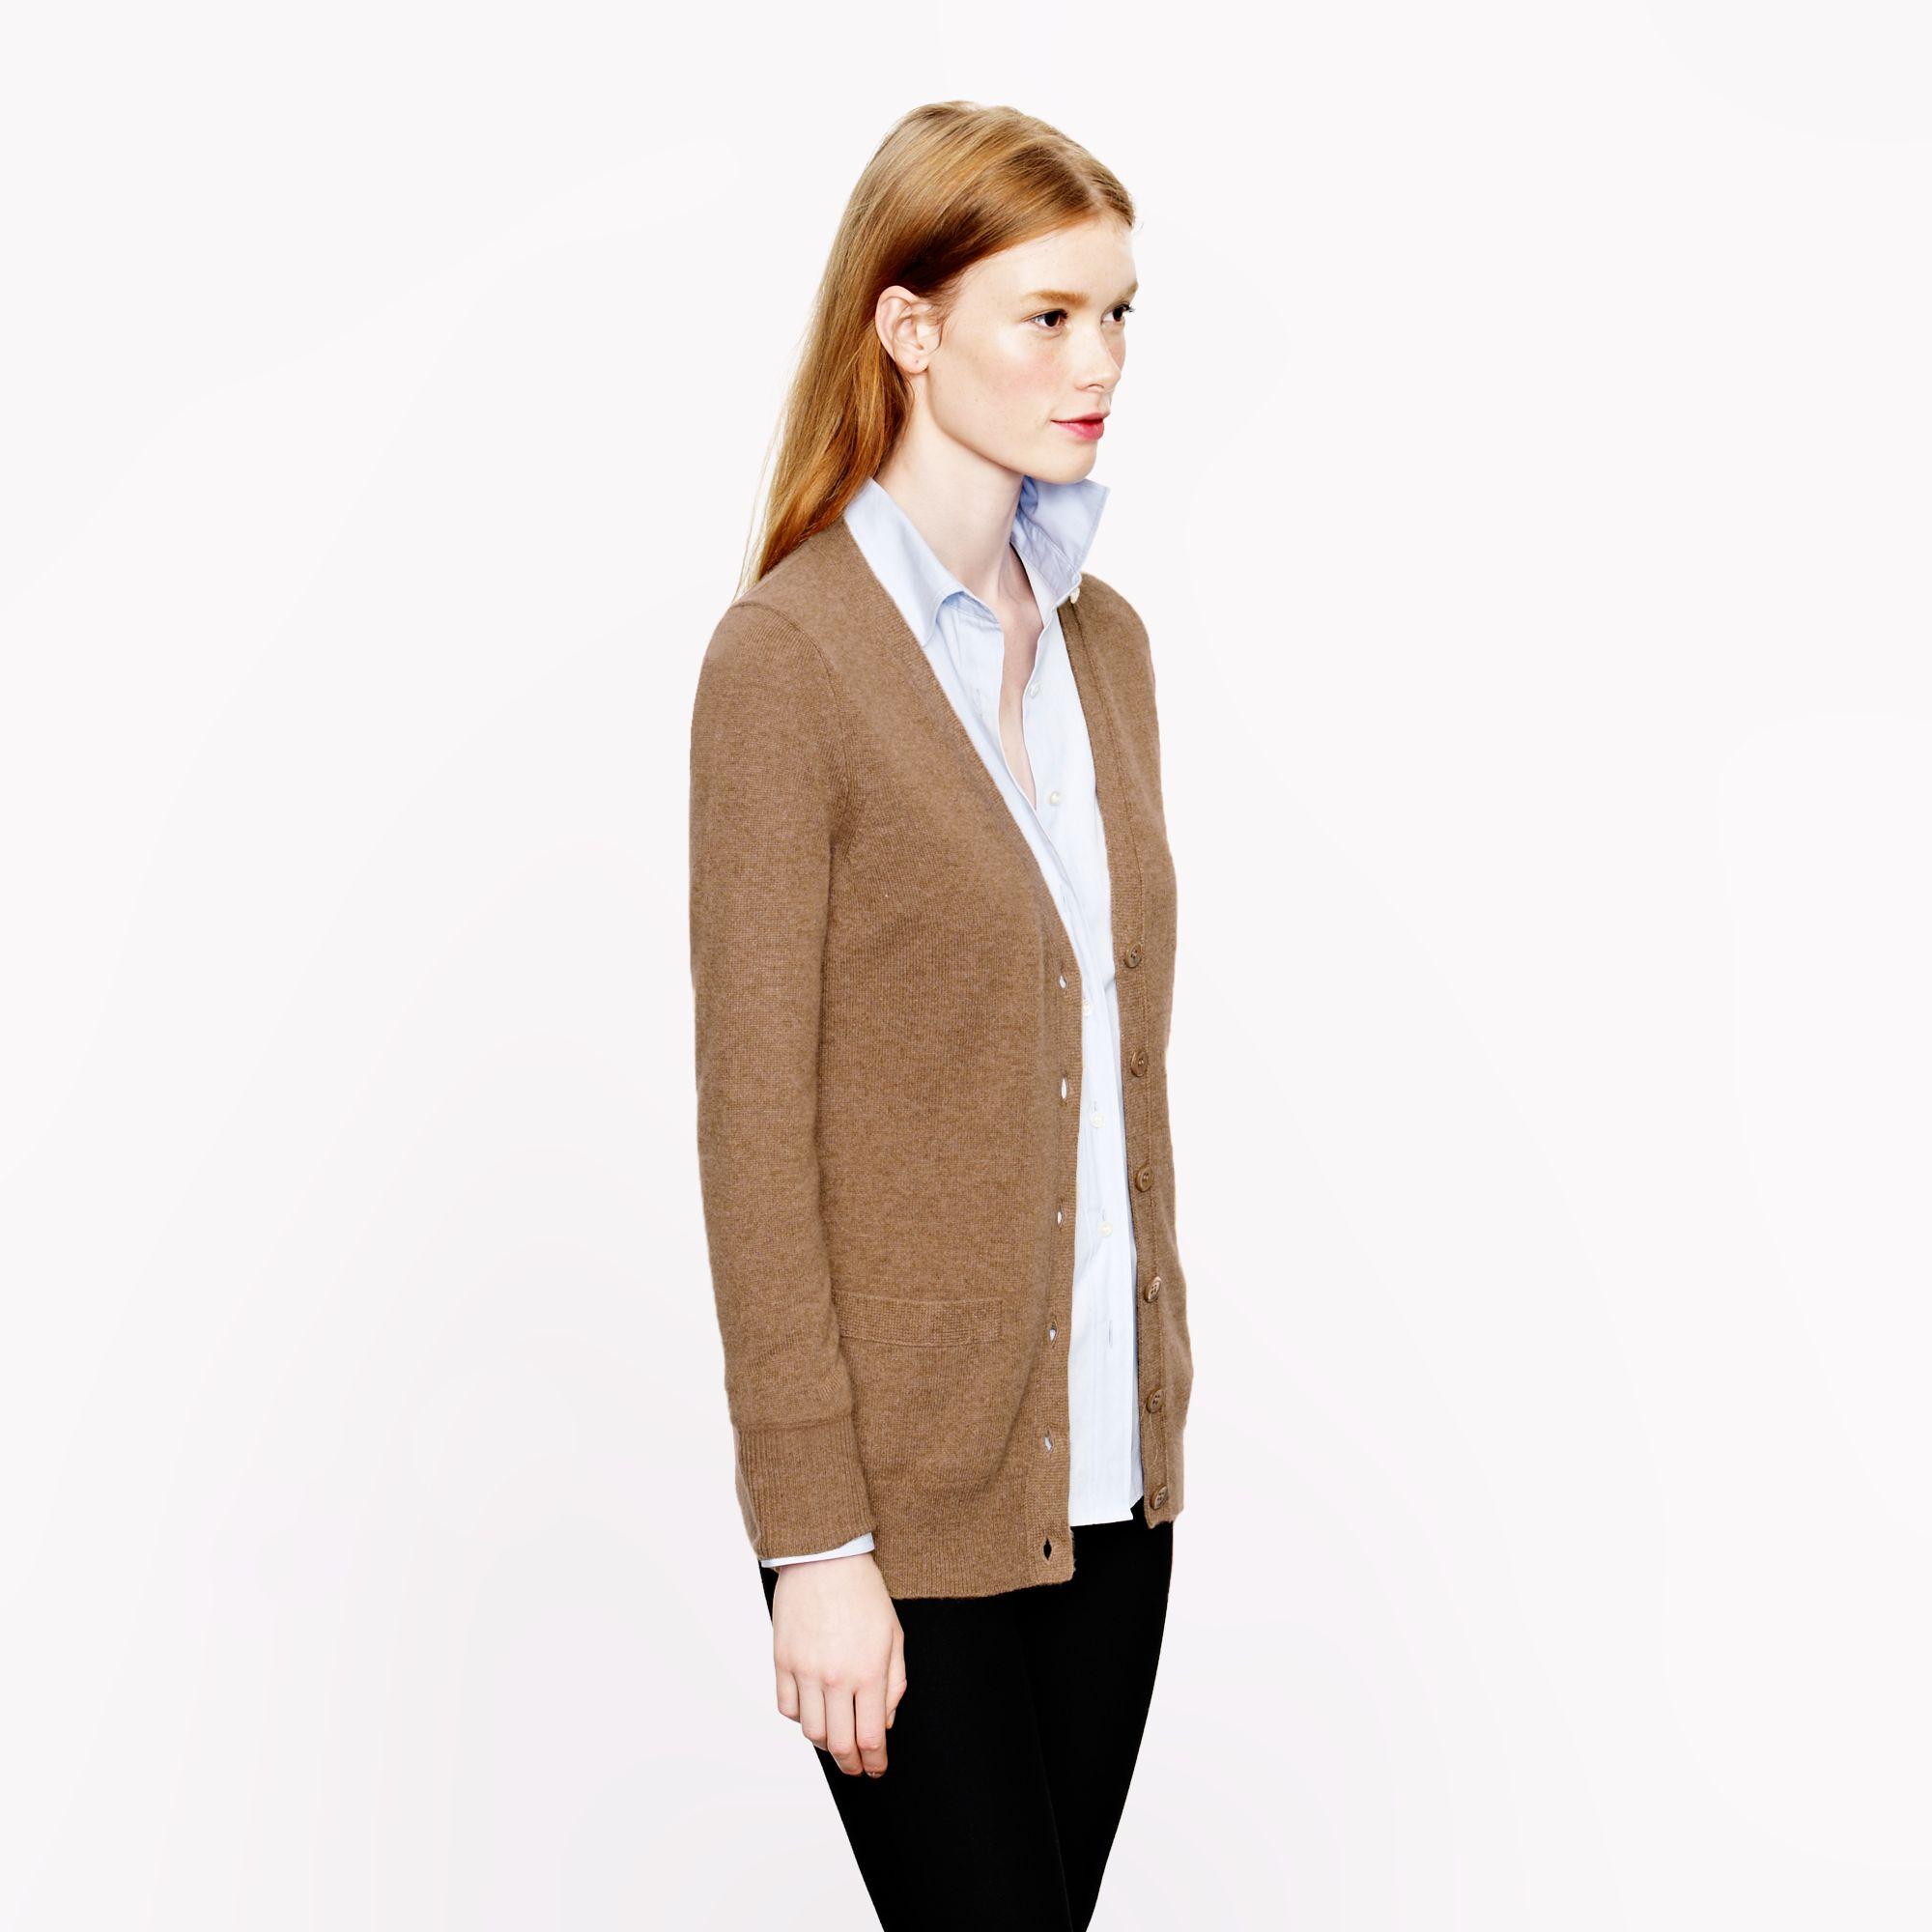 J.crew Collection Cashmere Boyfriend Cardigan Sweater in Brown | Lyst